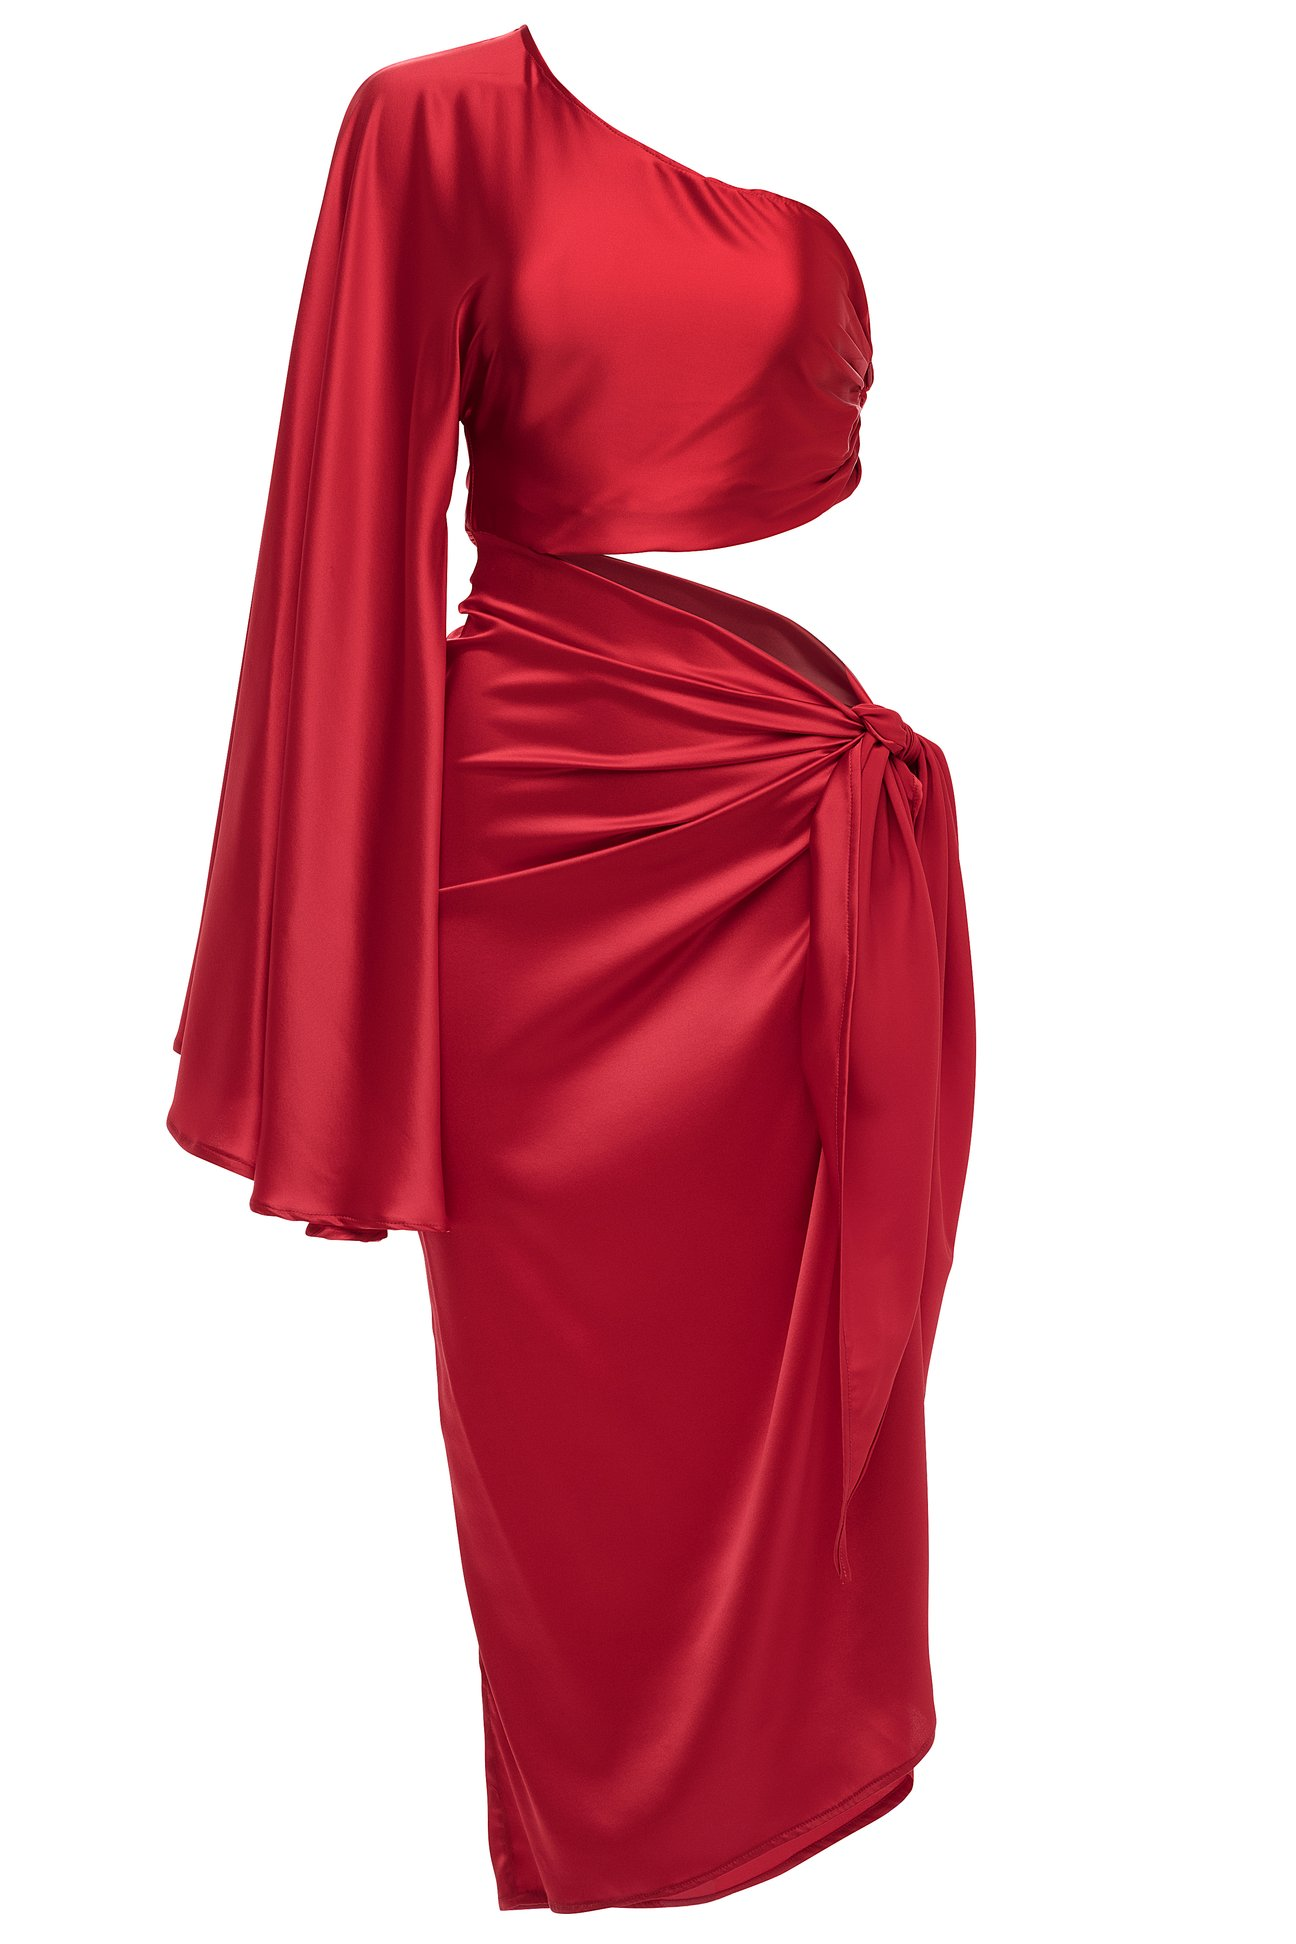 Silk gown, Fe Noel